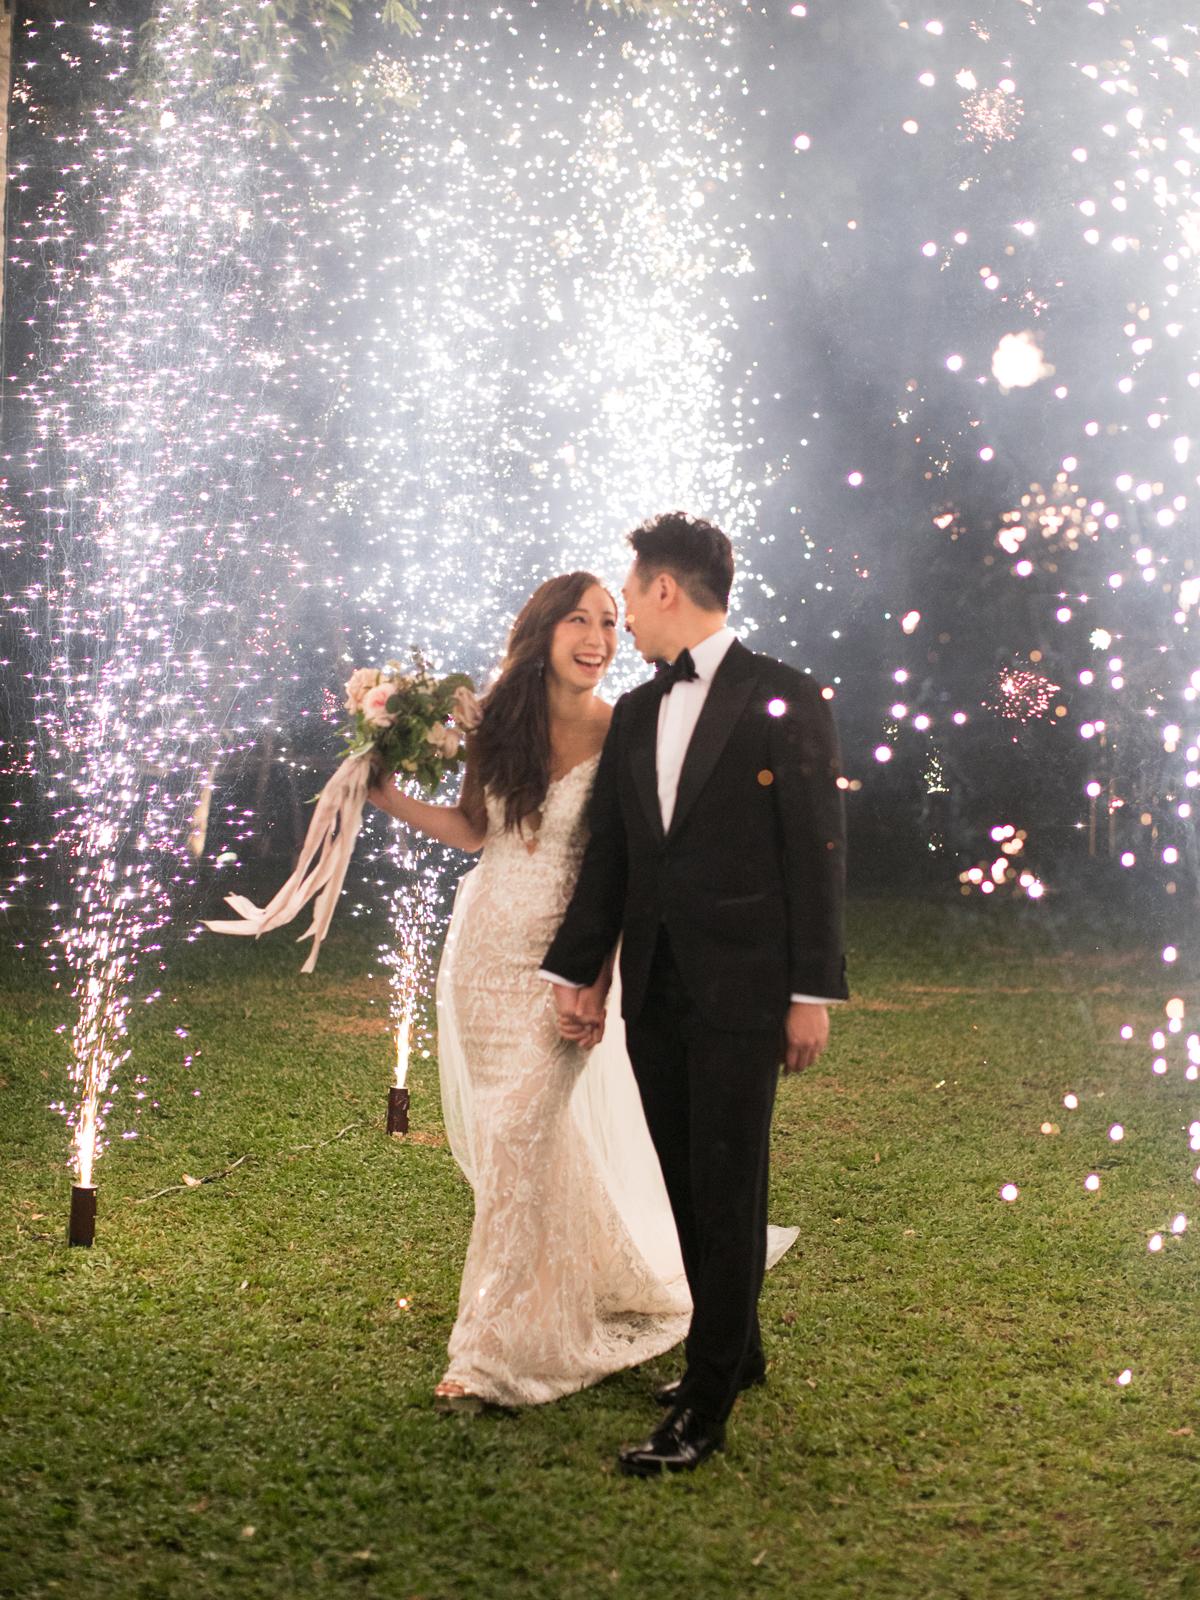 jada-jeffrey-wedding-sparklers-0619.jpg